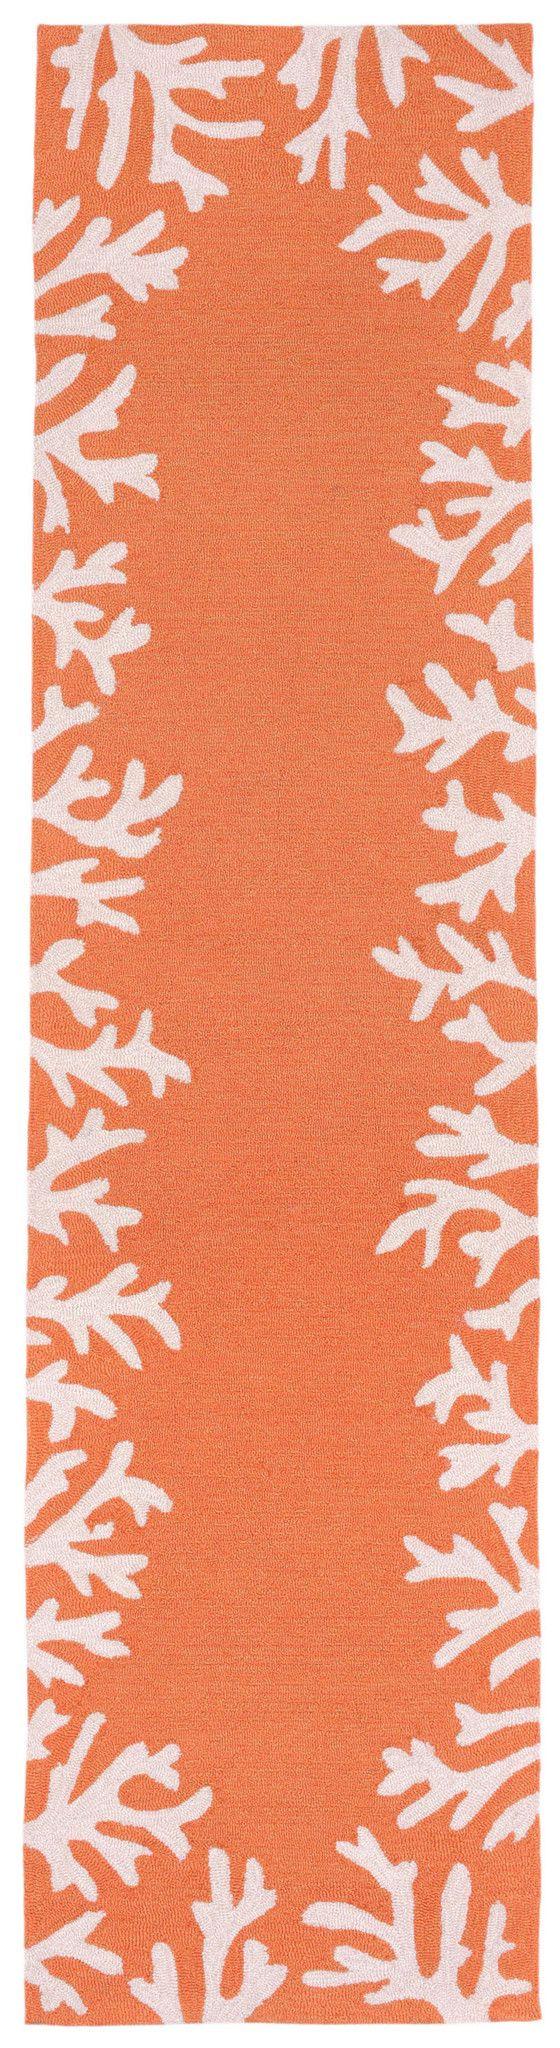 best  coral rug ideas on pinterest  coastal inspired rugs  - capri  coral border coral rug